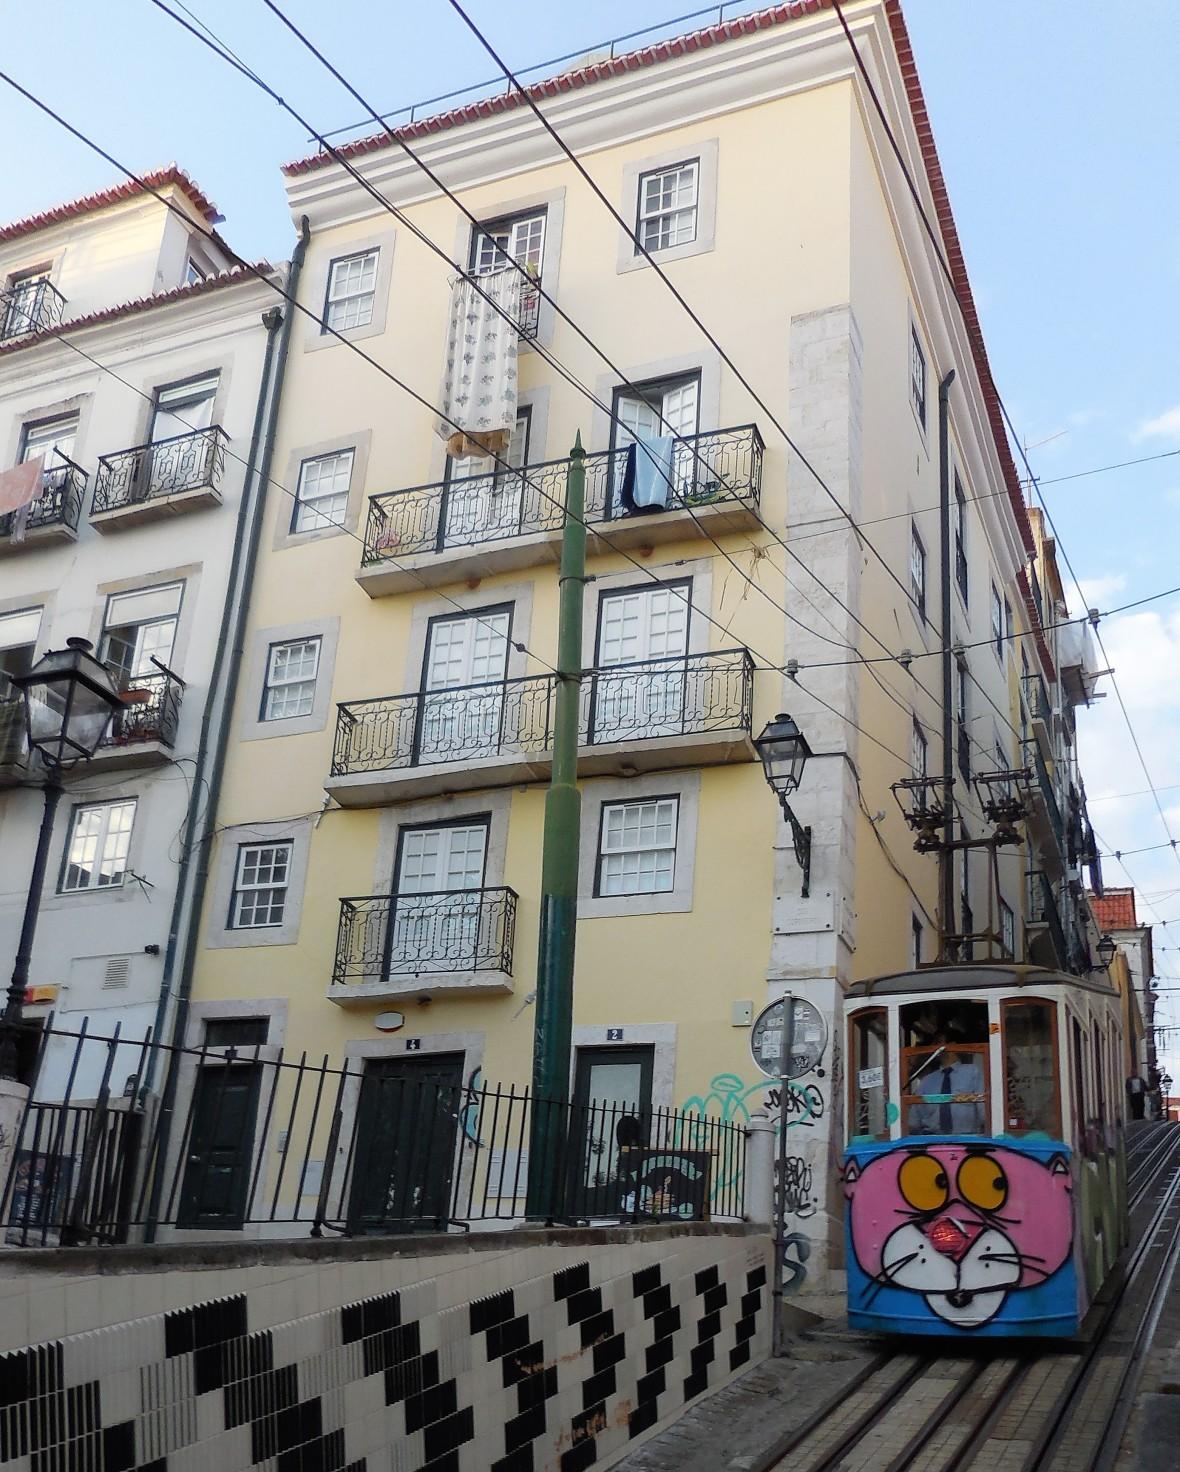 Portugal - Lisbonne  (4)